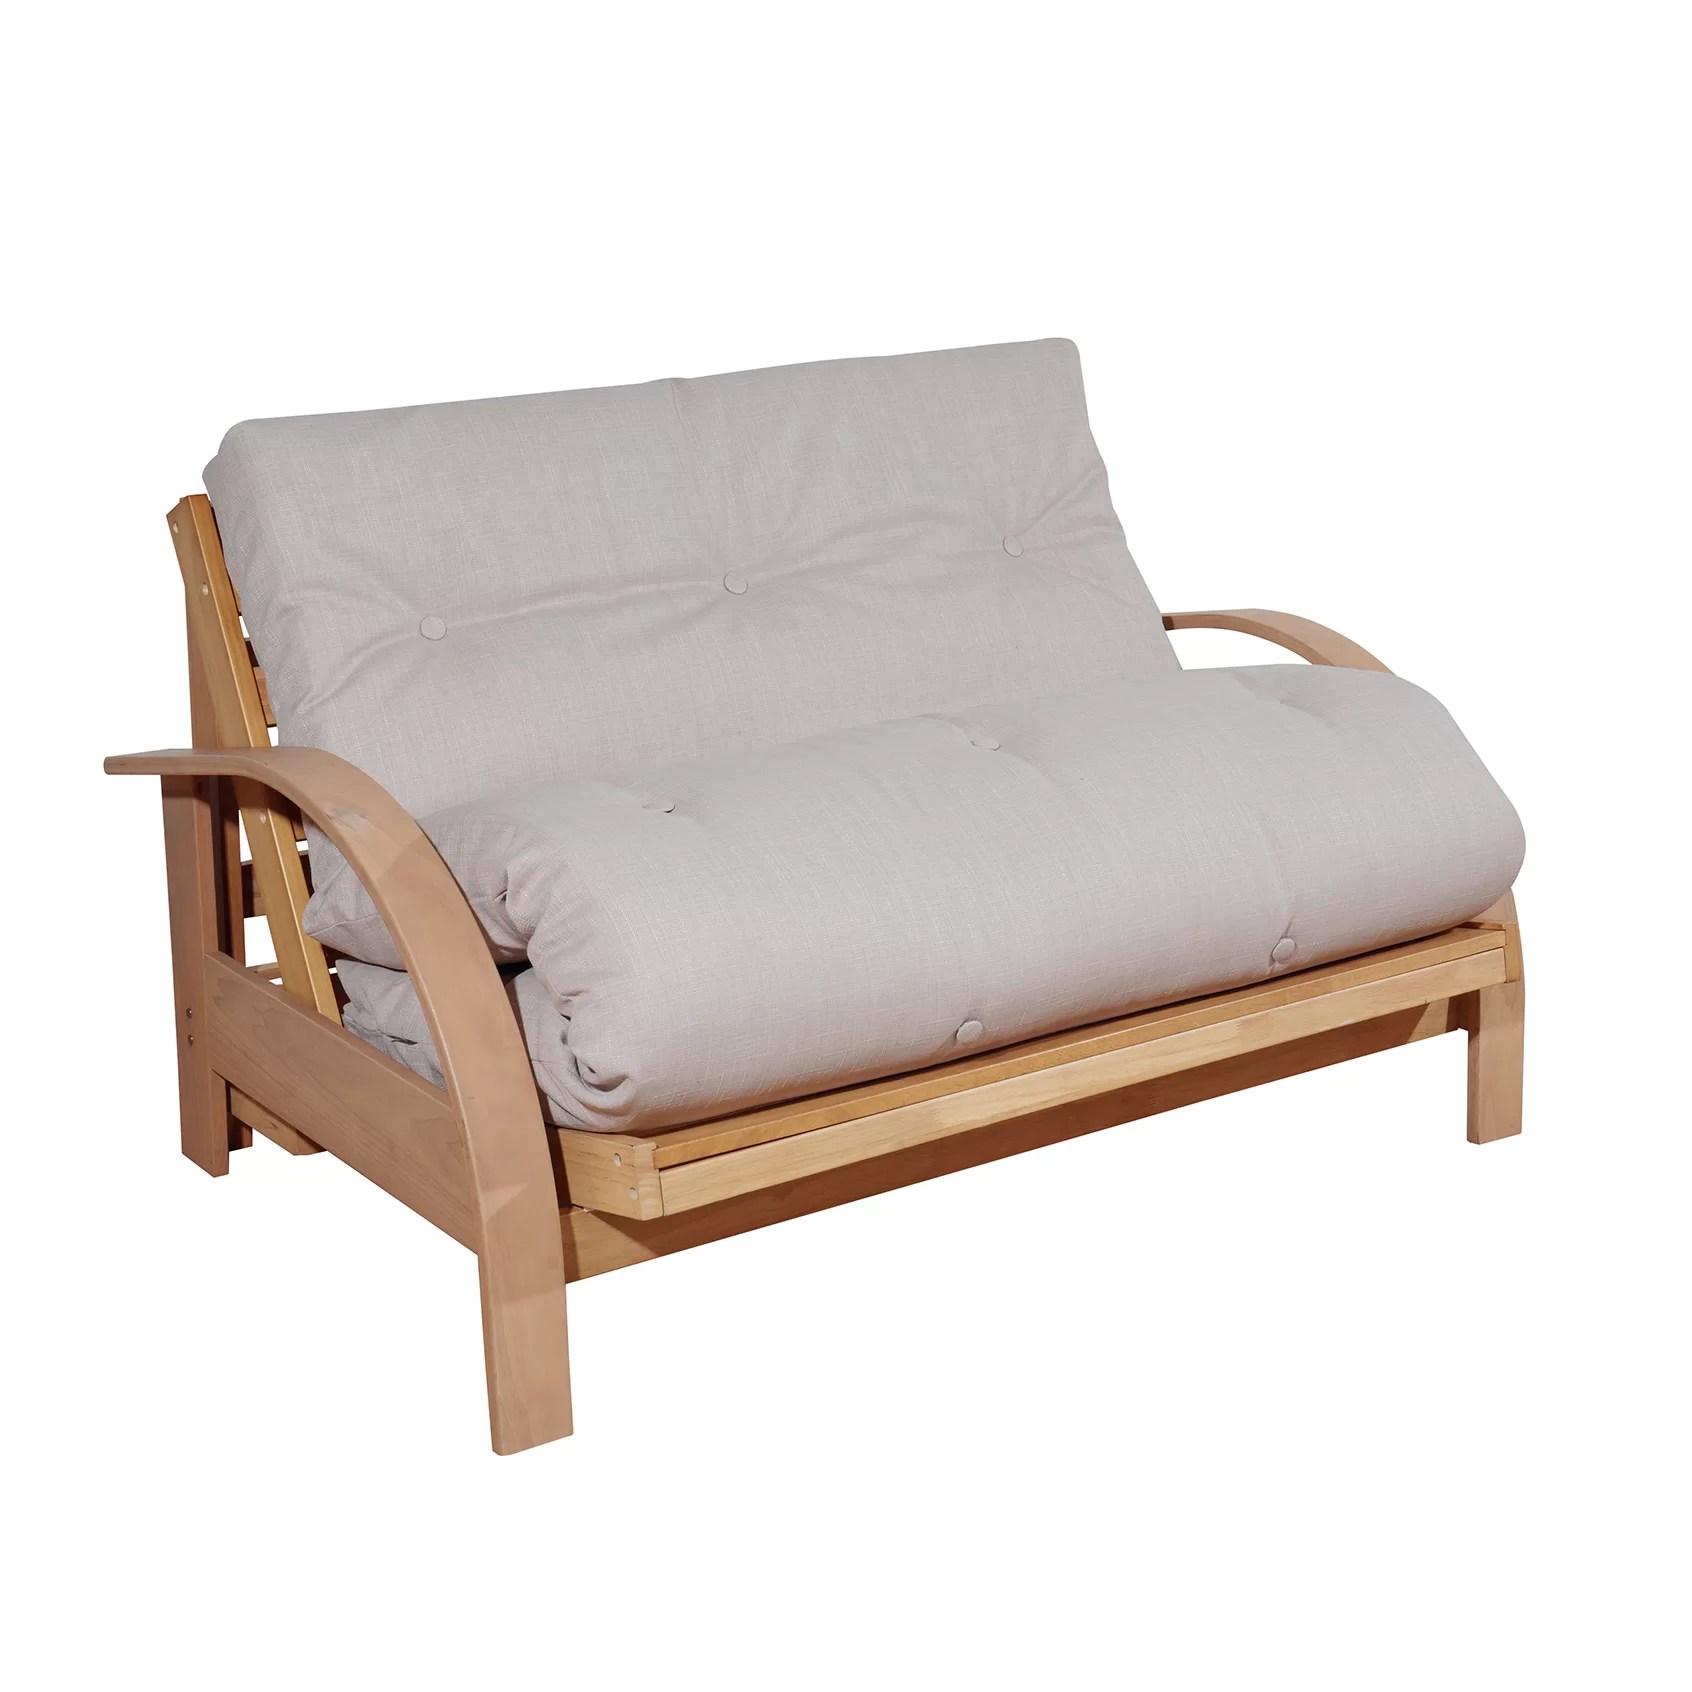 convertible sofa beds new york how to make arm protectors kyoto futon and reviews wayfair uk